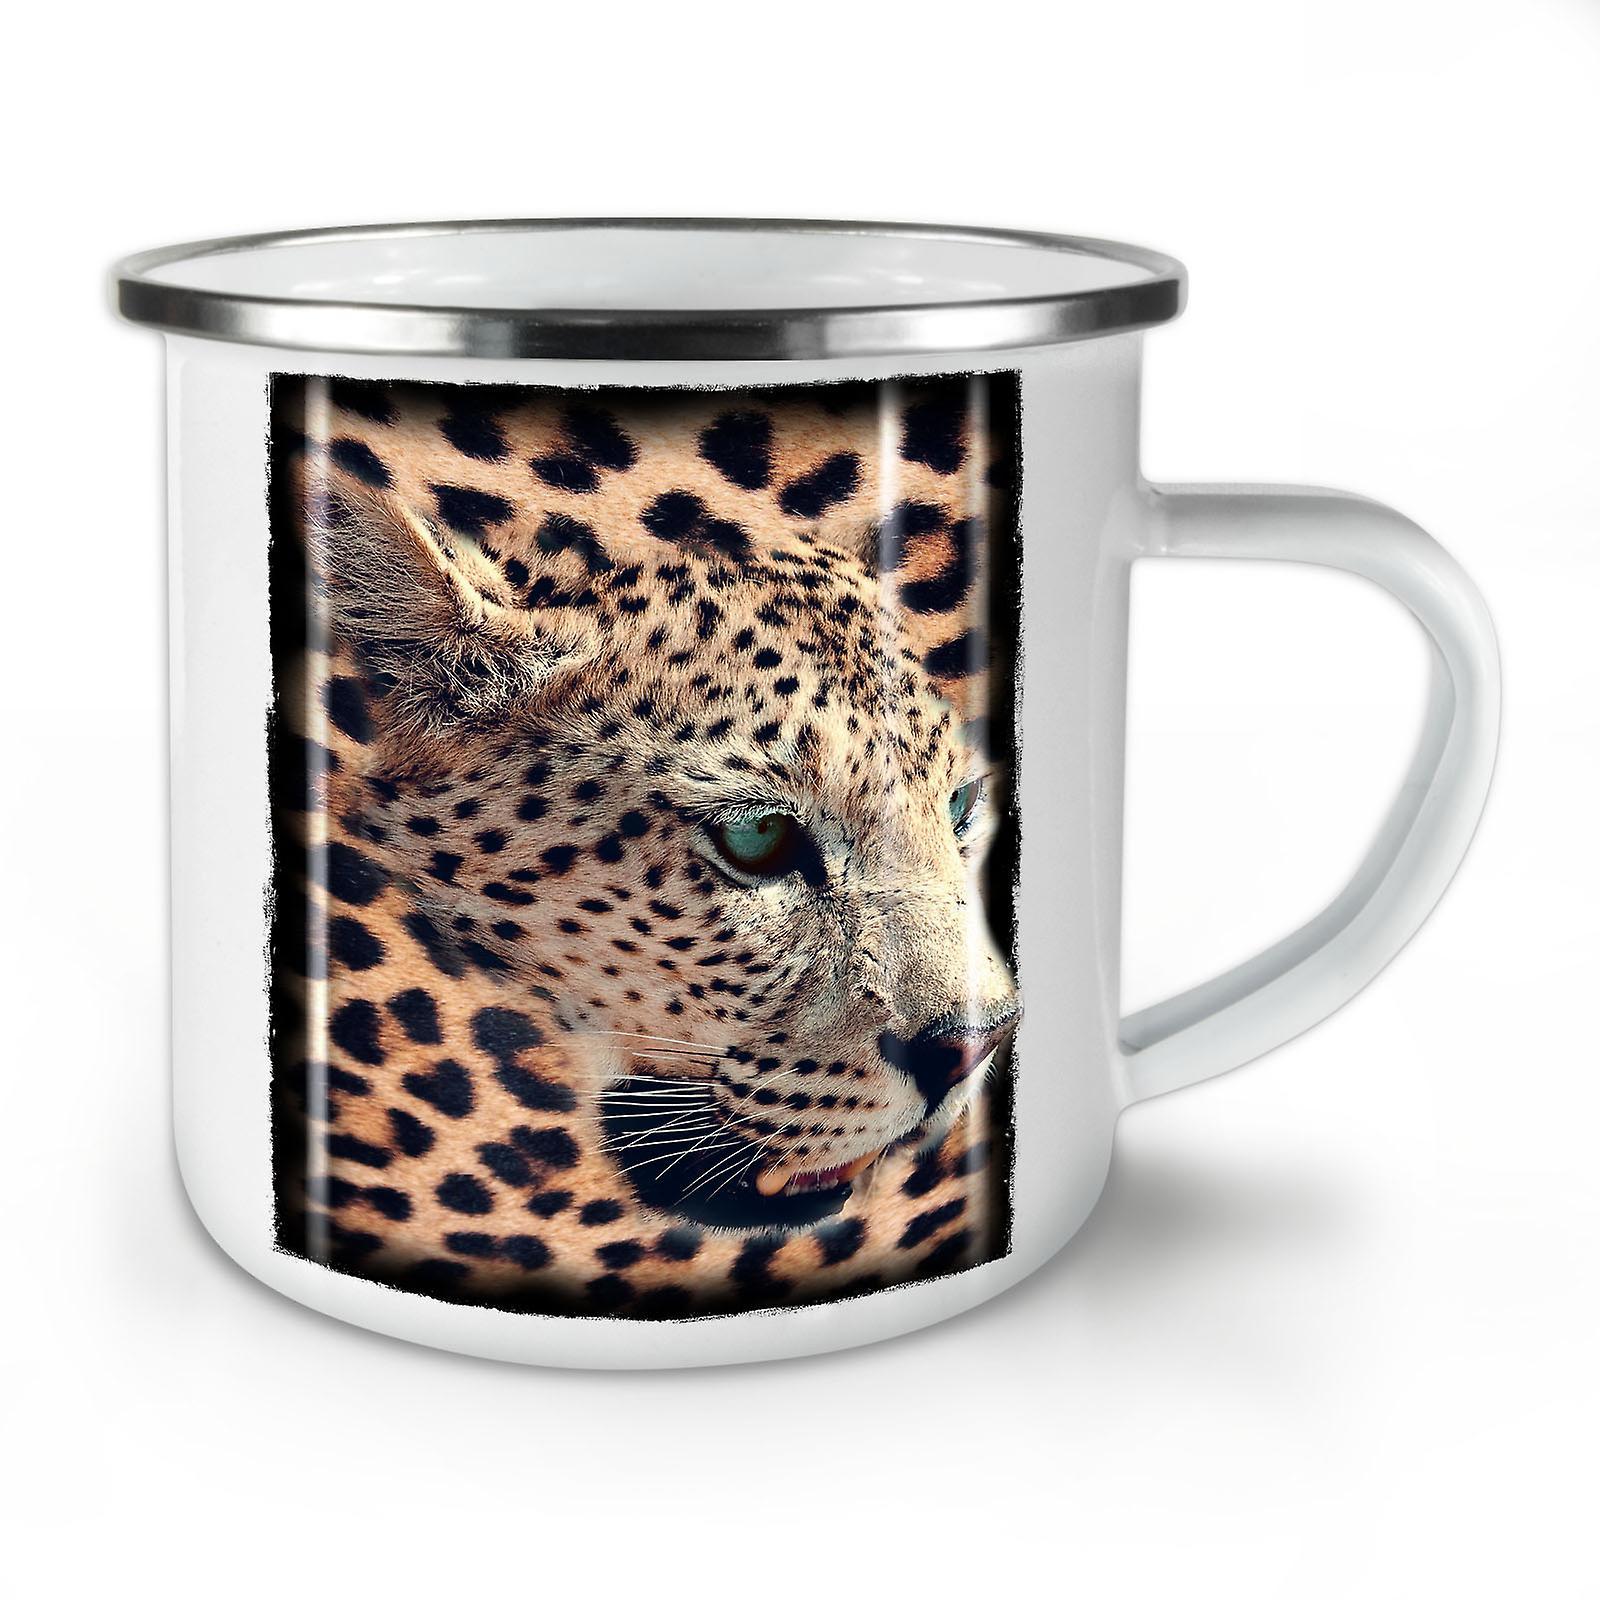 Mug10 Whitetea OzWellcoda Café Émail Animal Nouveau Sauvage 0m8nOvwNy